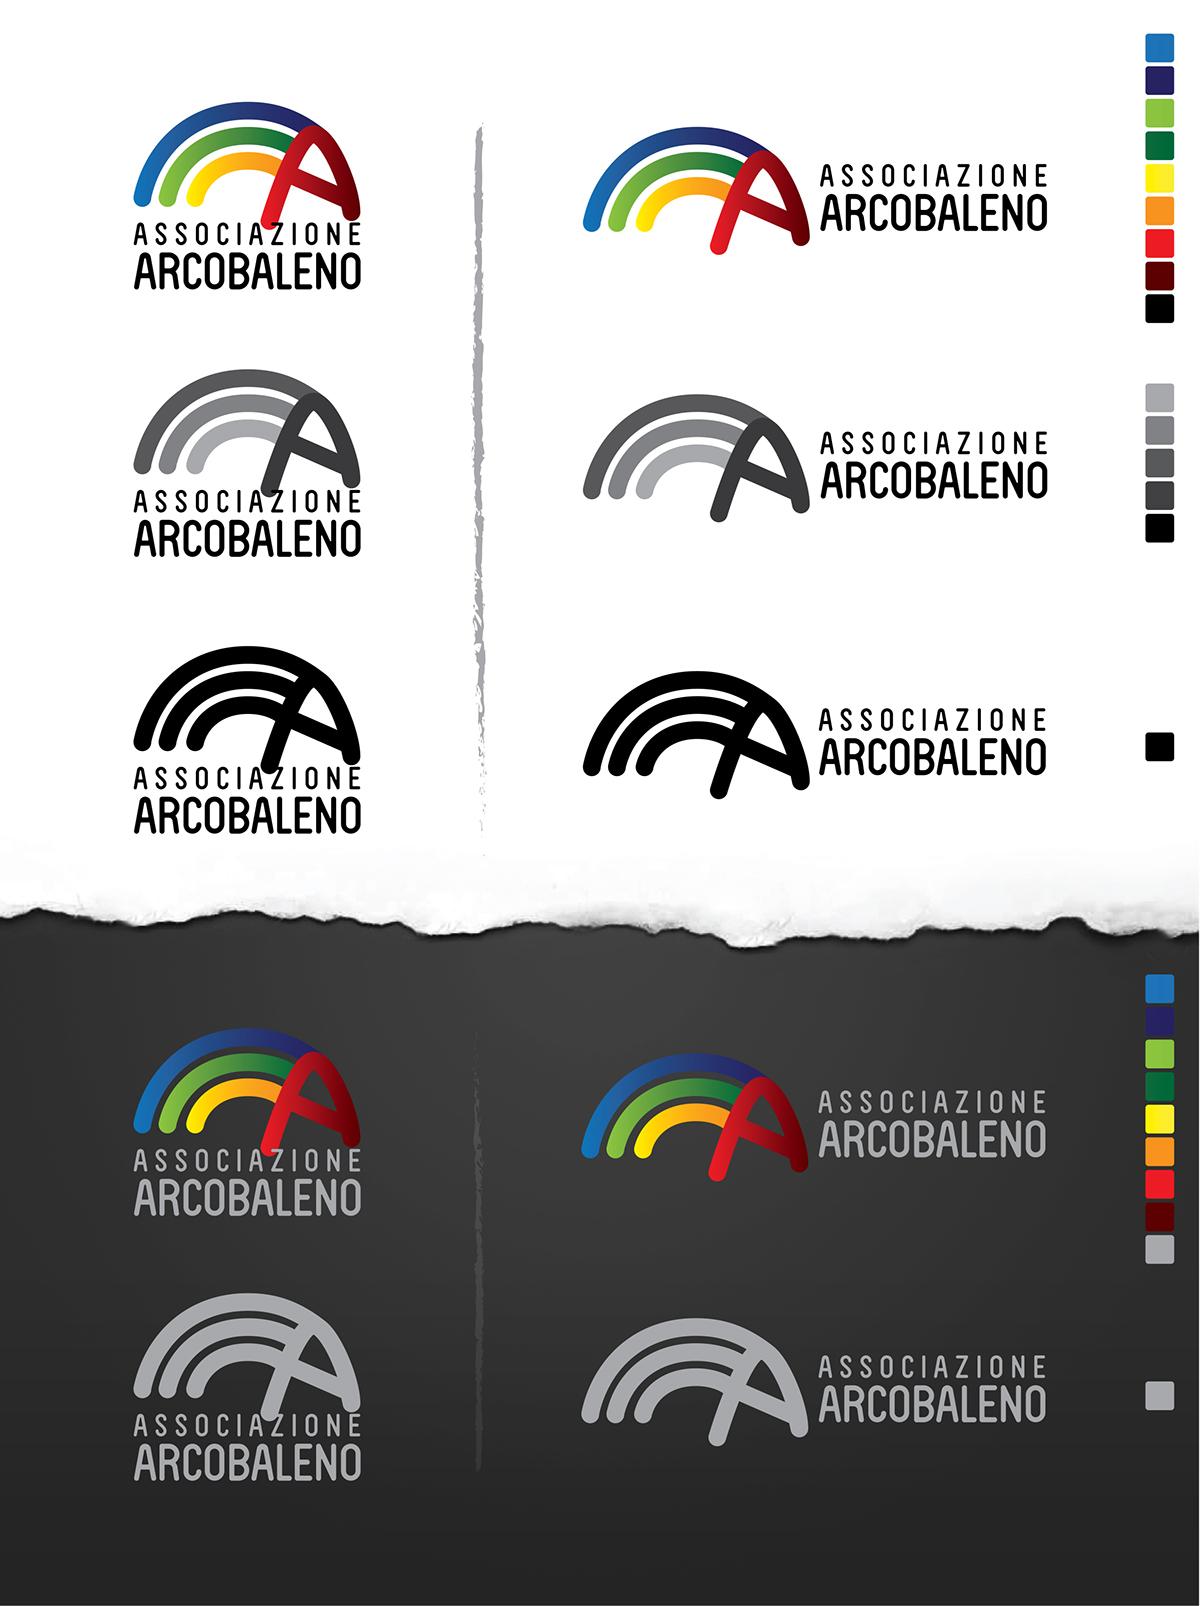 logo Logotype brand corporate image design type face lettering inspiration Brand Image identity